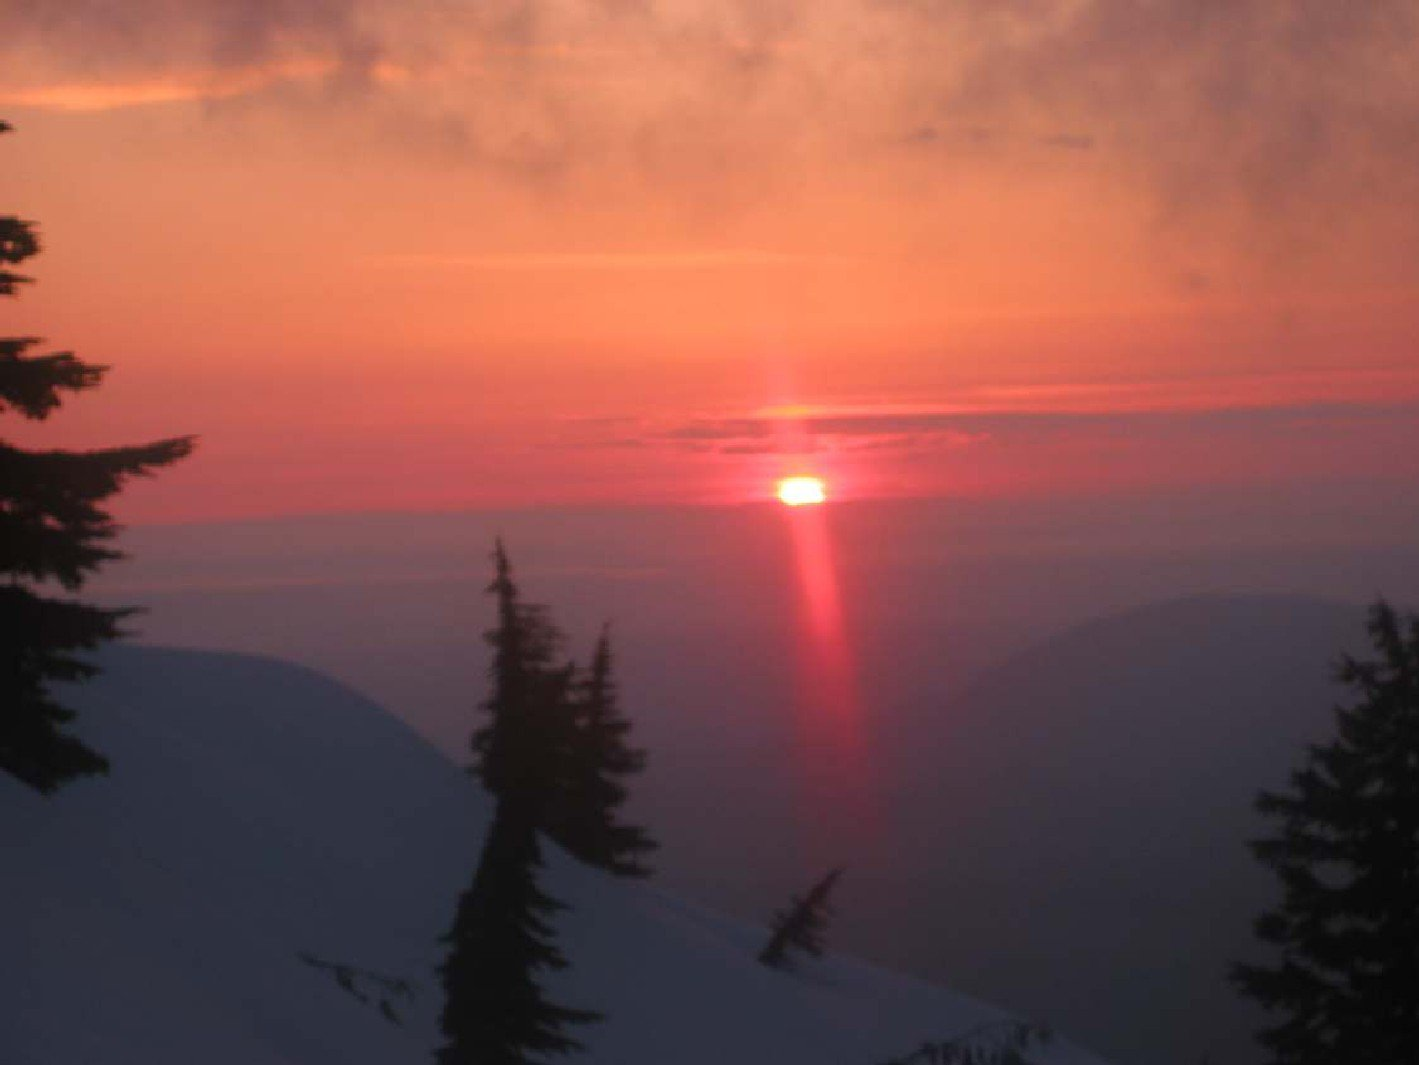 Top of mt. Pilchuck Sunset